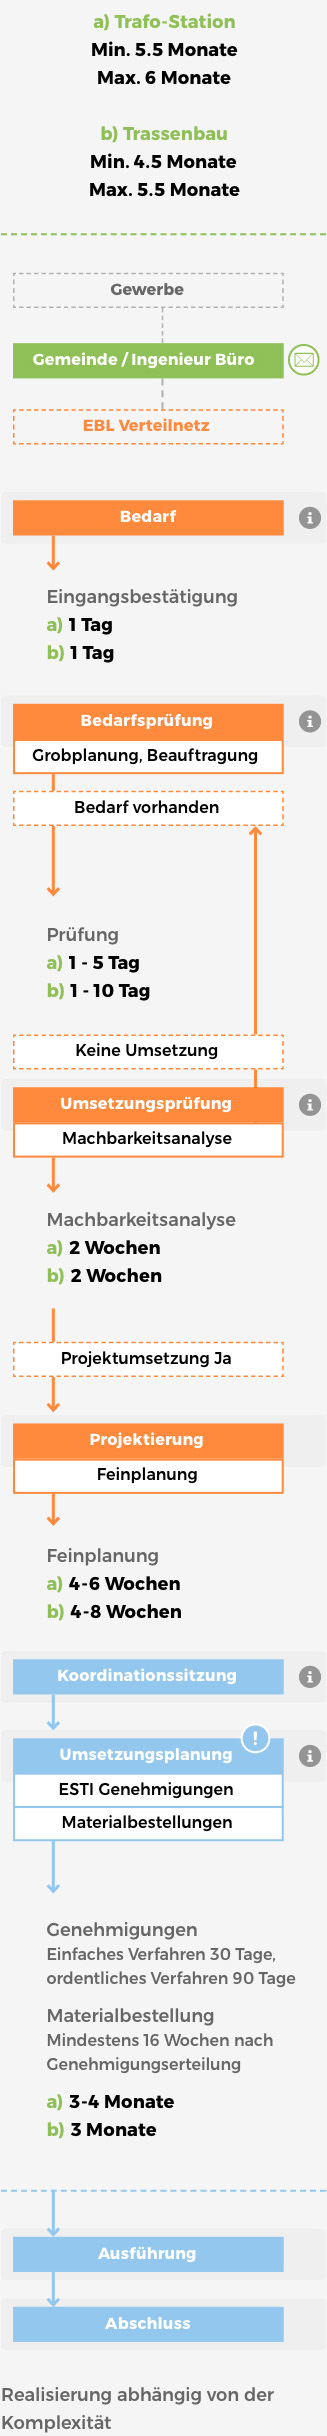 Grafik Netzablauf-mobile